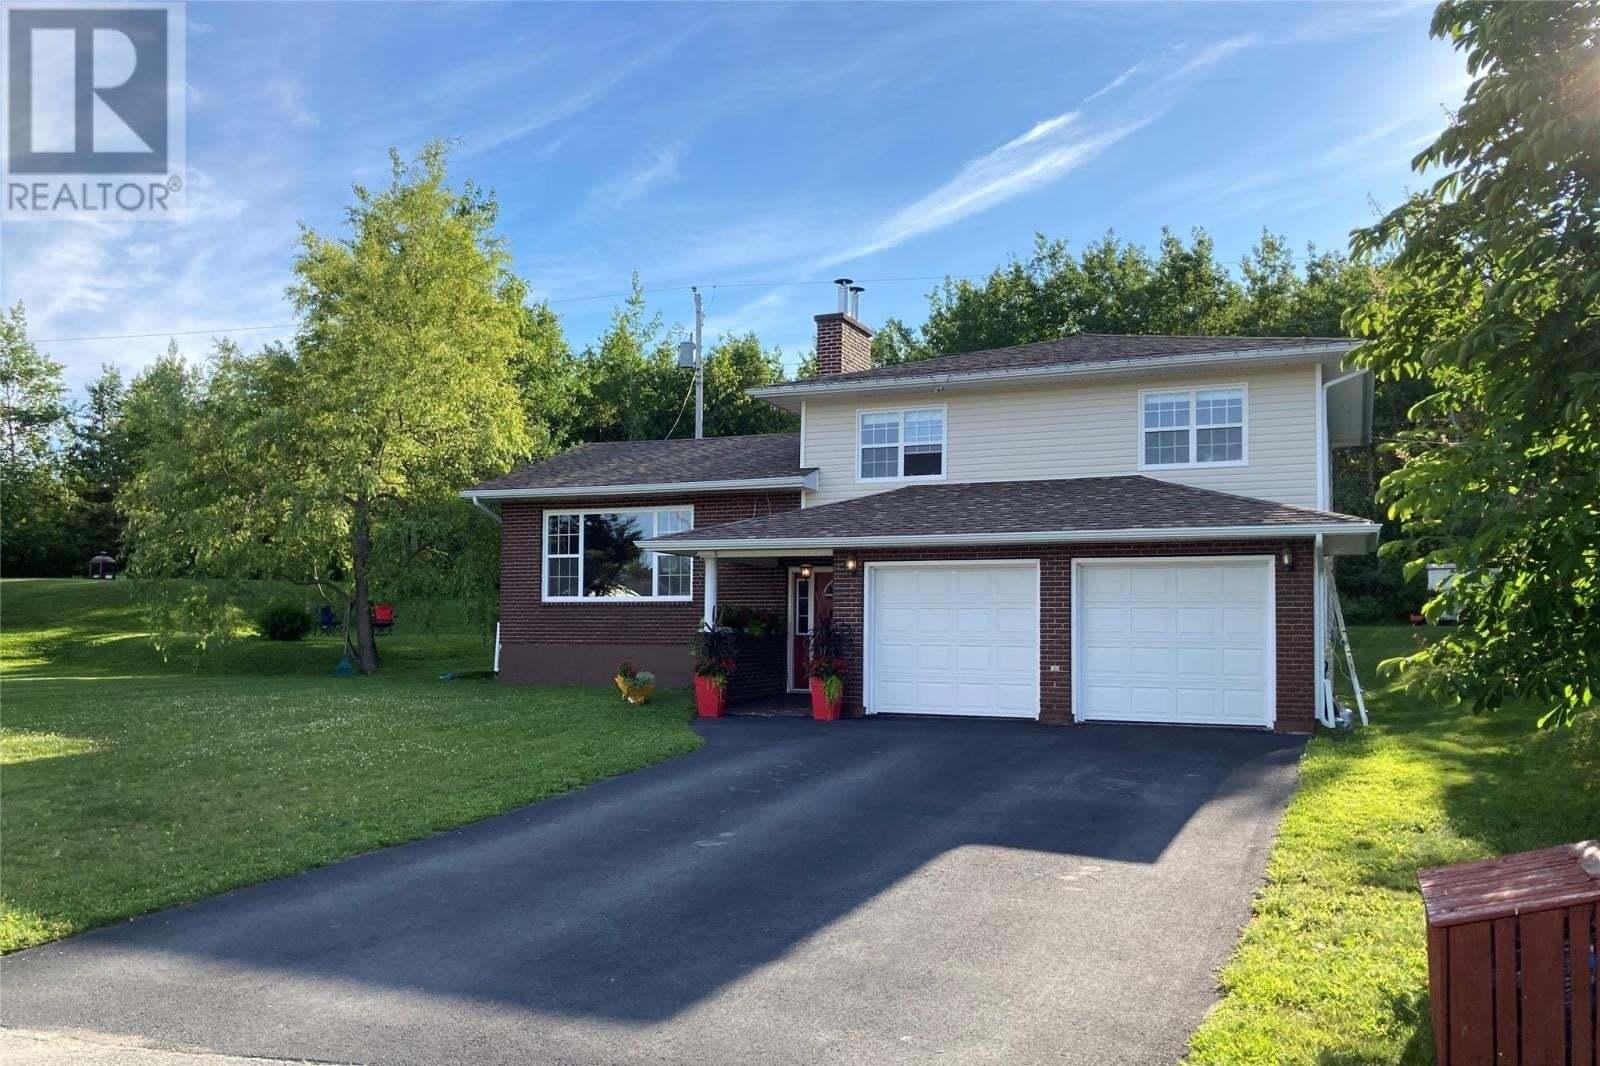 House for sale at 3 Maple Pl Lewisporte Newfoundland - MLS: 1217106